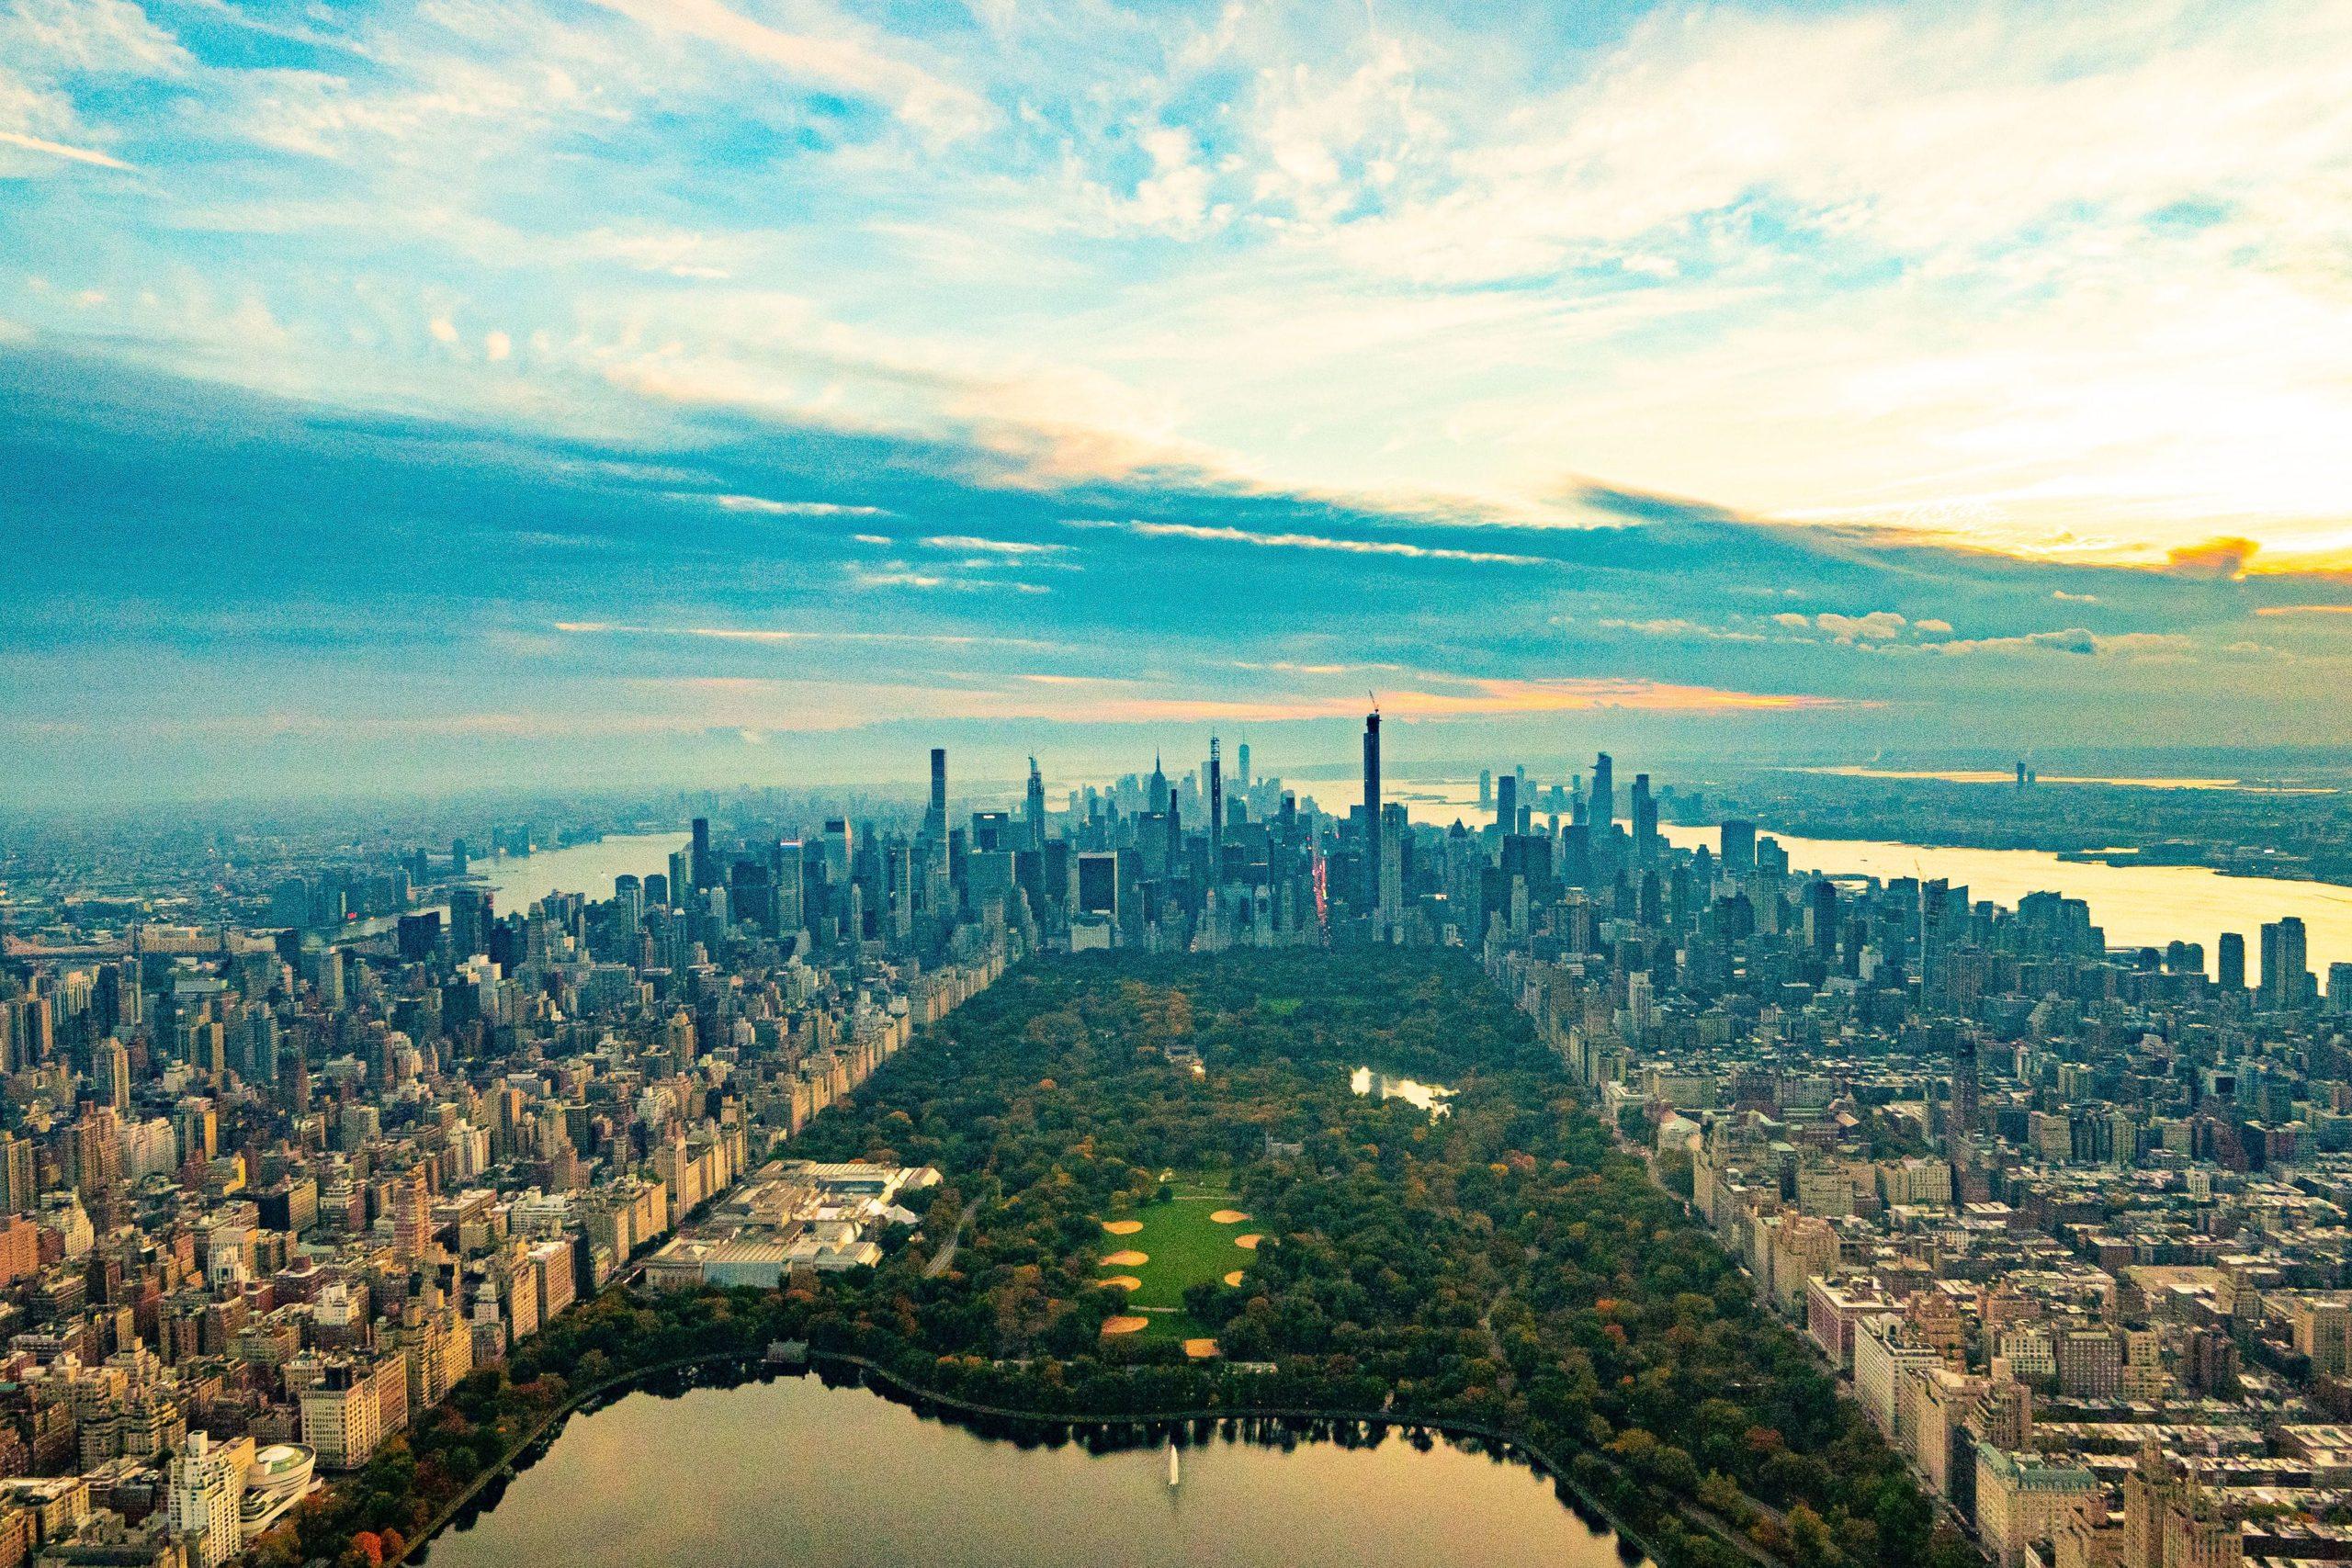 Central Park birds eye view